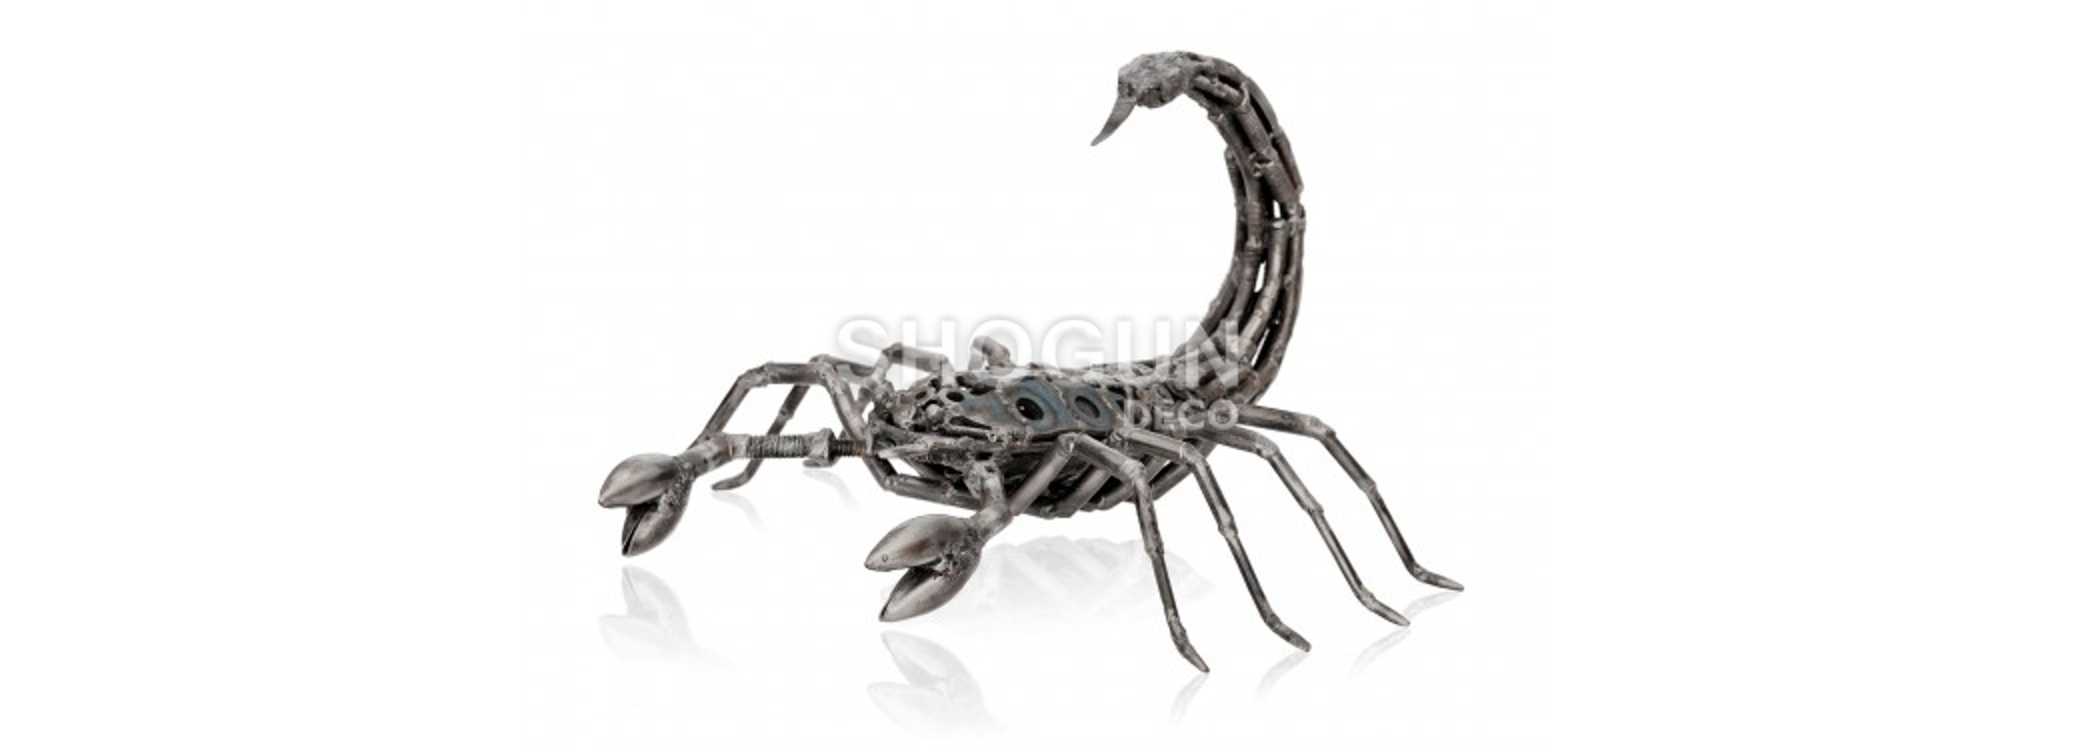 Sculpture de Scorpion en pièces de motos